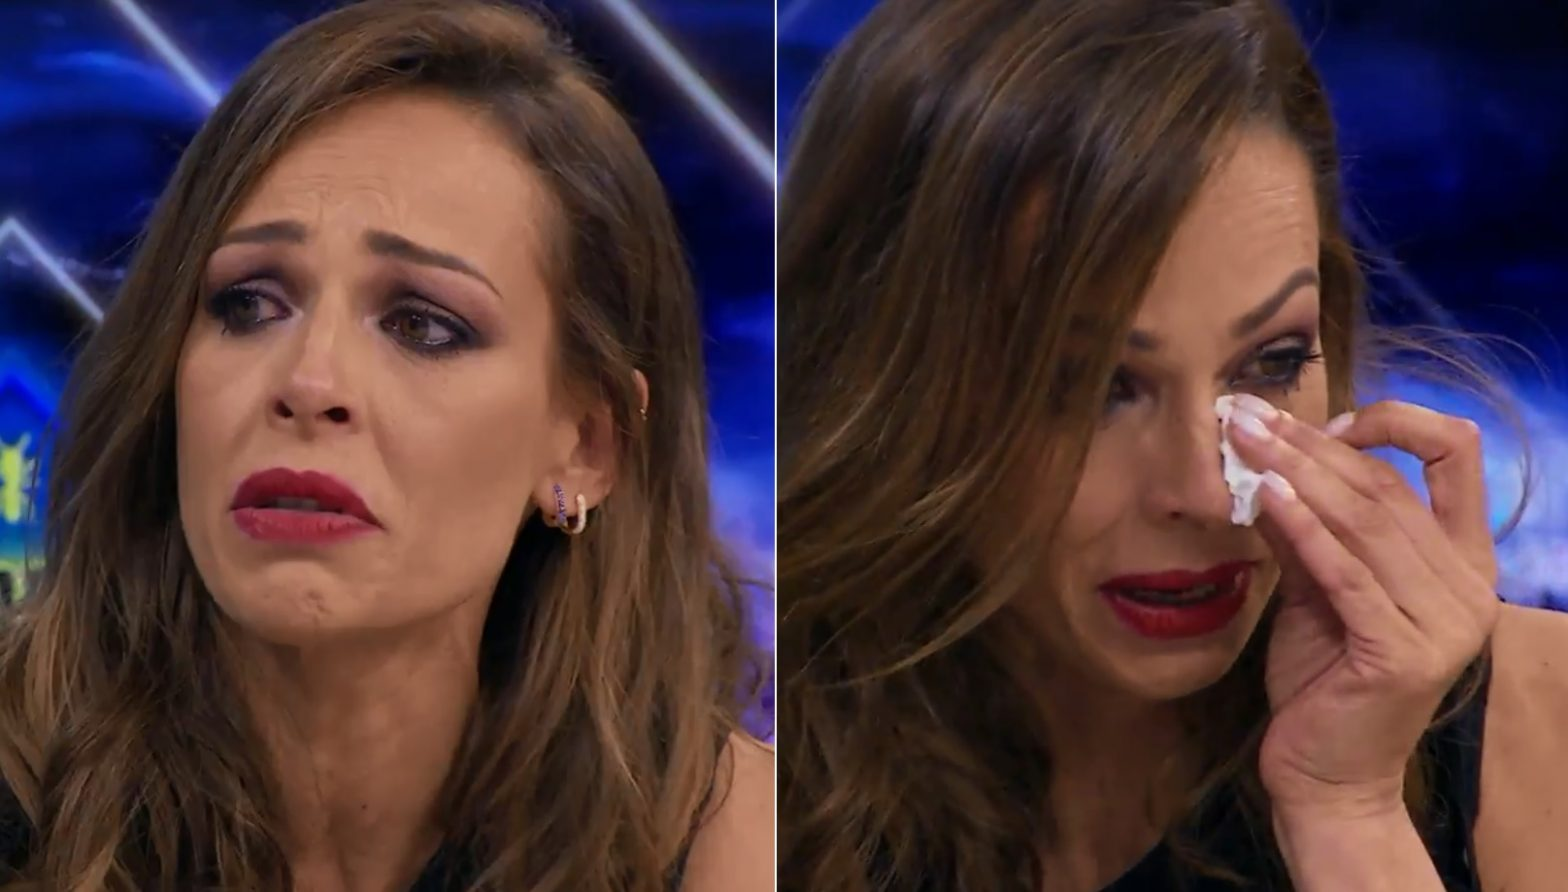 La bonita historia de amor que ha hecho llorar a Eva González y a miles de espectadores